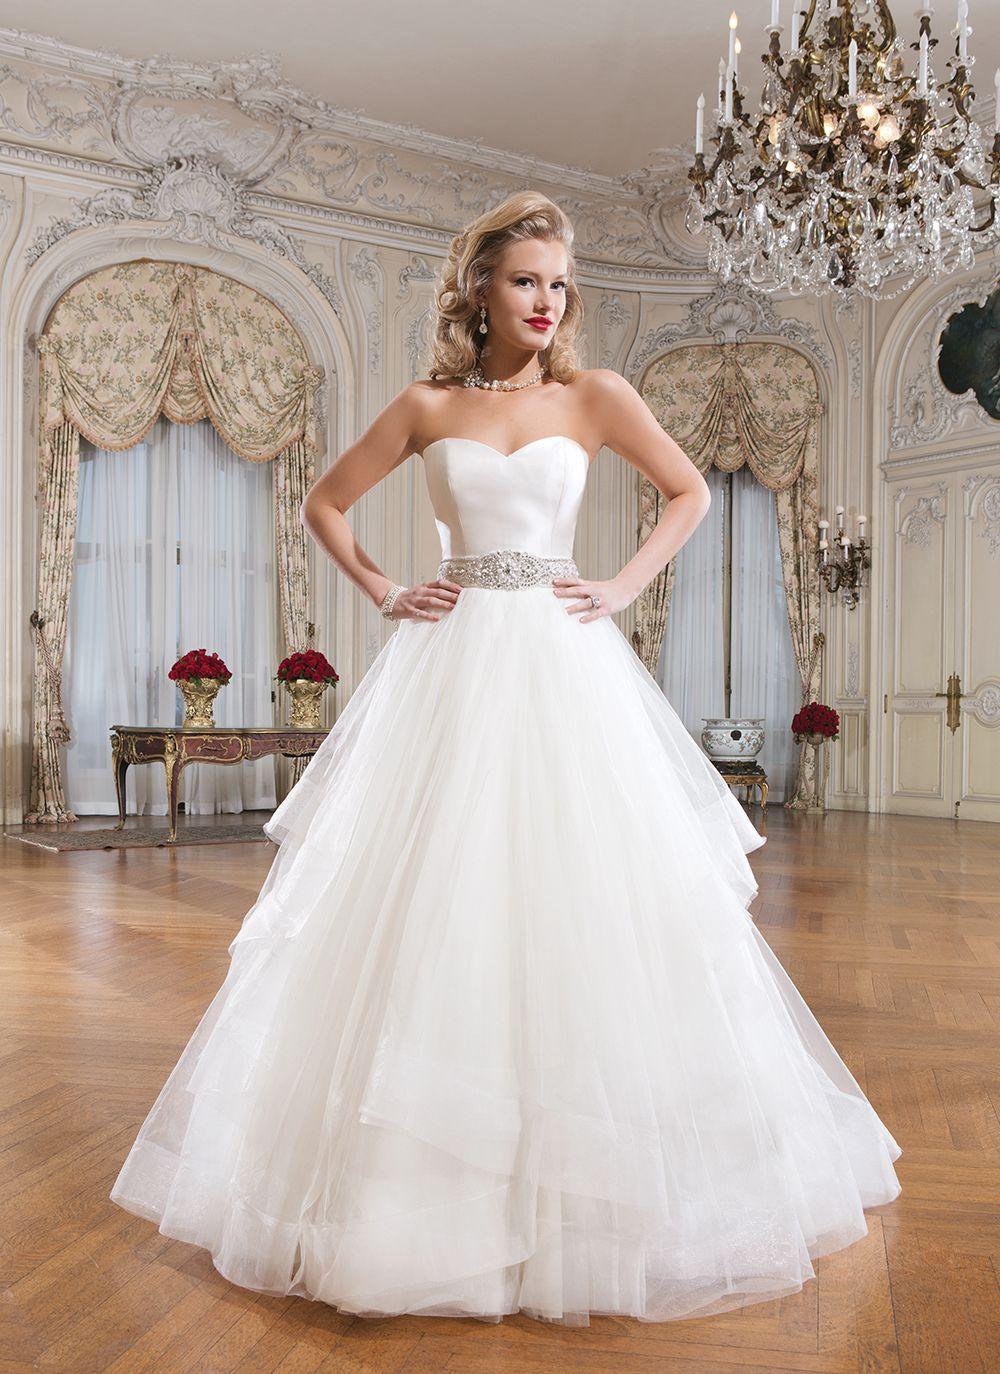 Justin alexander wedding dresses style tulle silk dupion ball